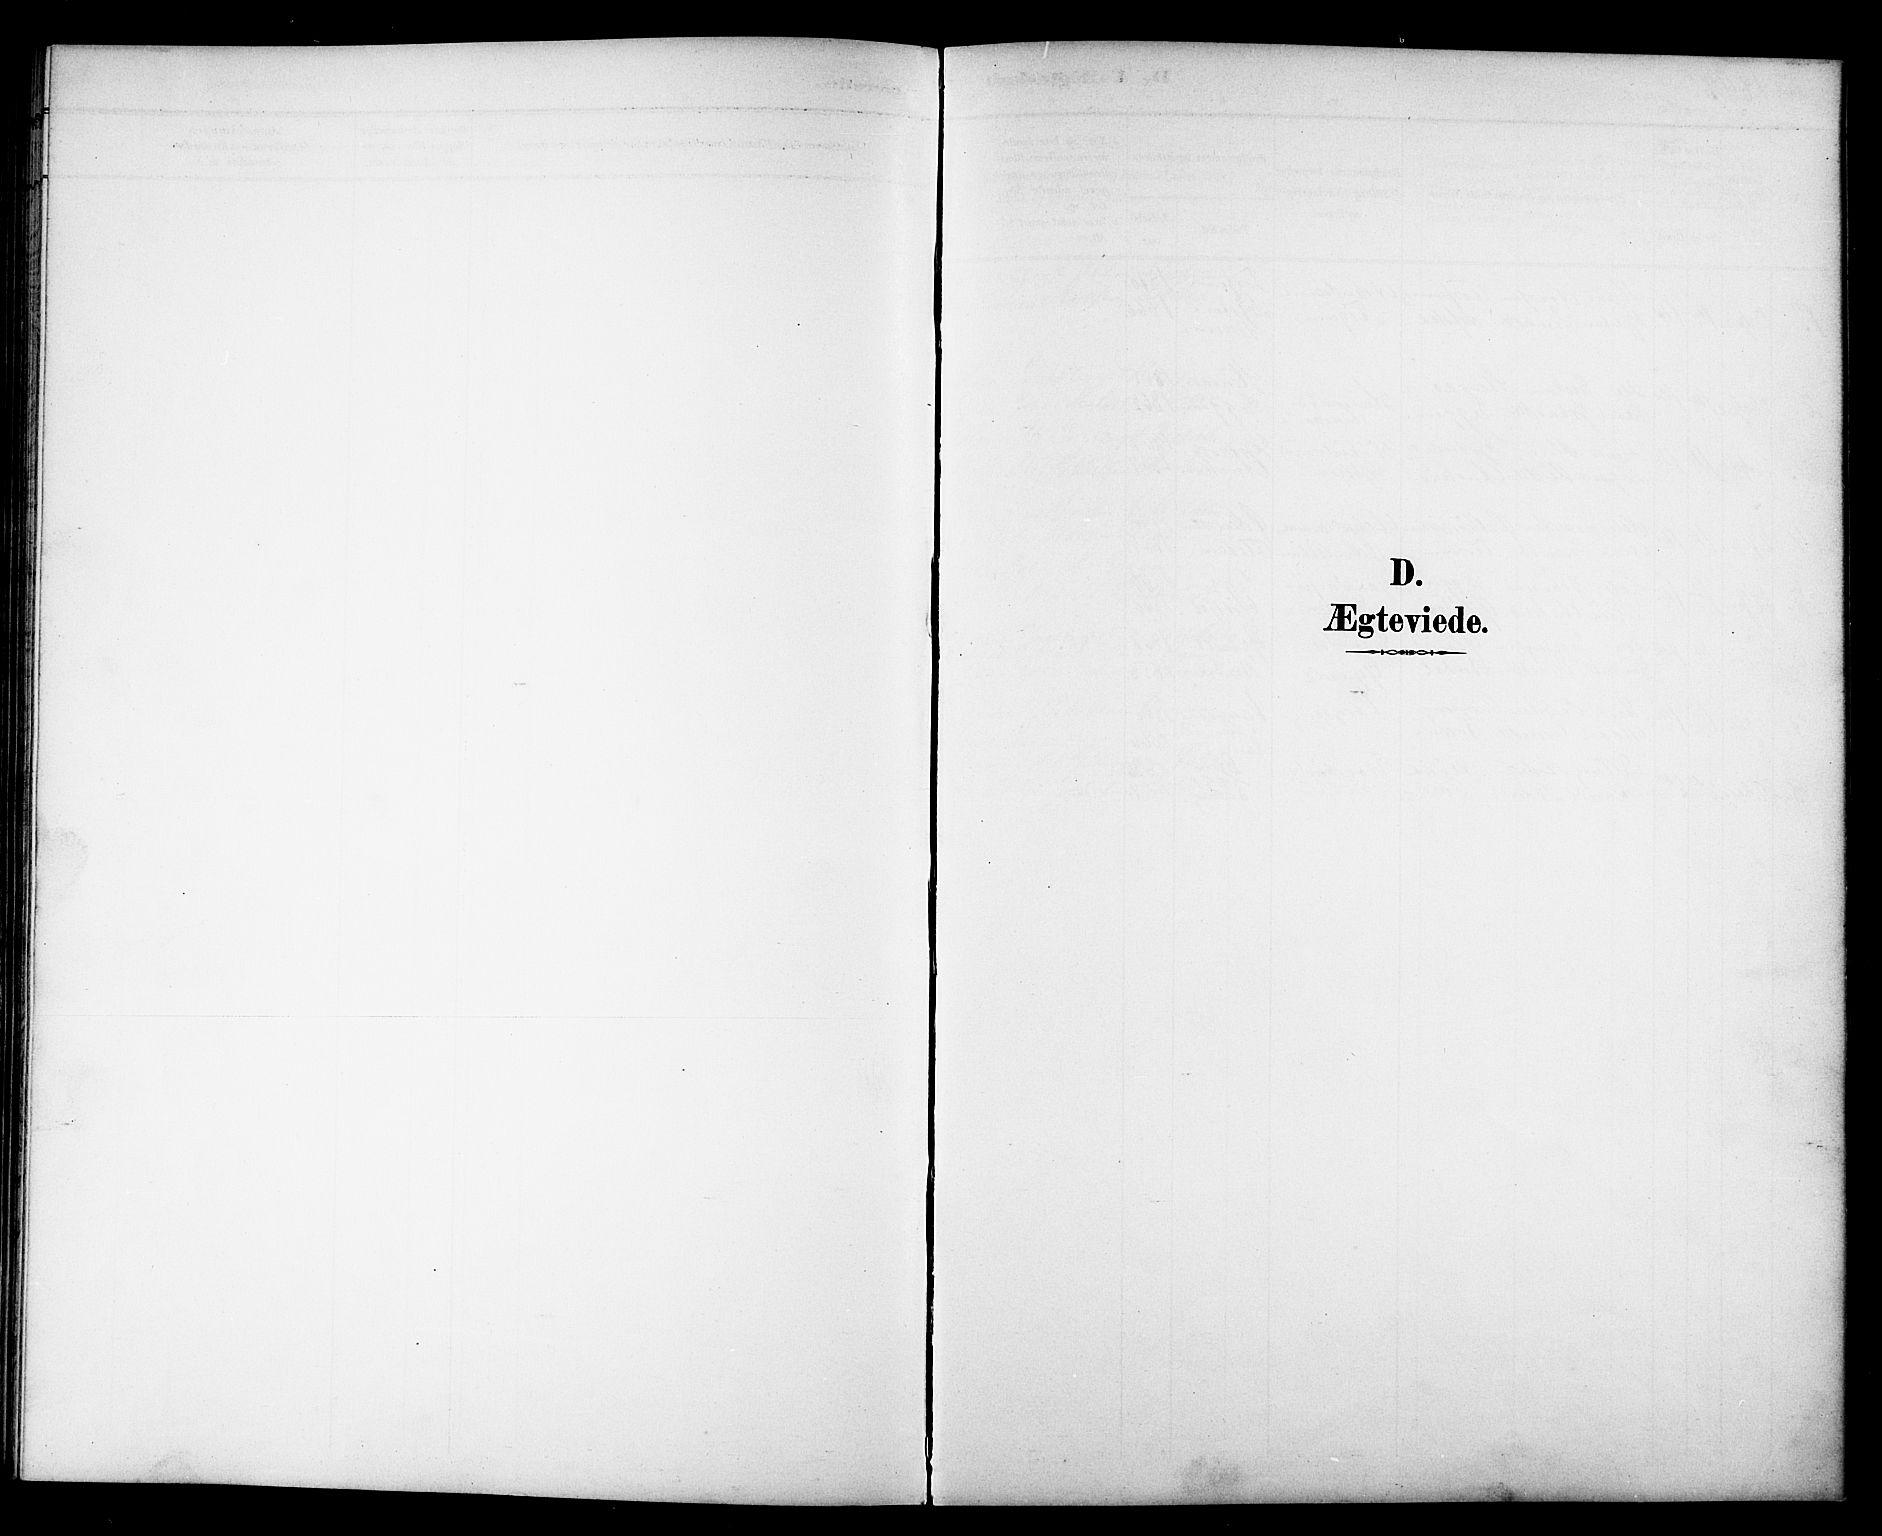 SAT, Ministerialprotokoller, klokkerbøker og fødselsregistre - Sør-Trøndelag, 689/L1044: Parish register (copy) no. 689C03, 1893-1922